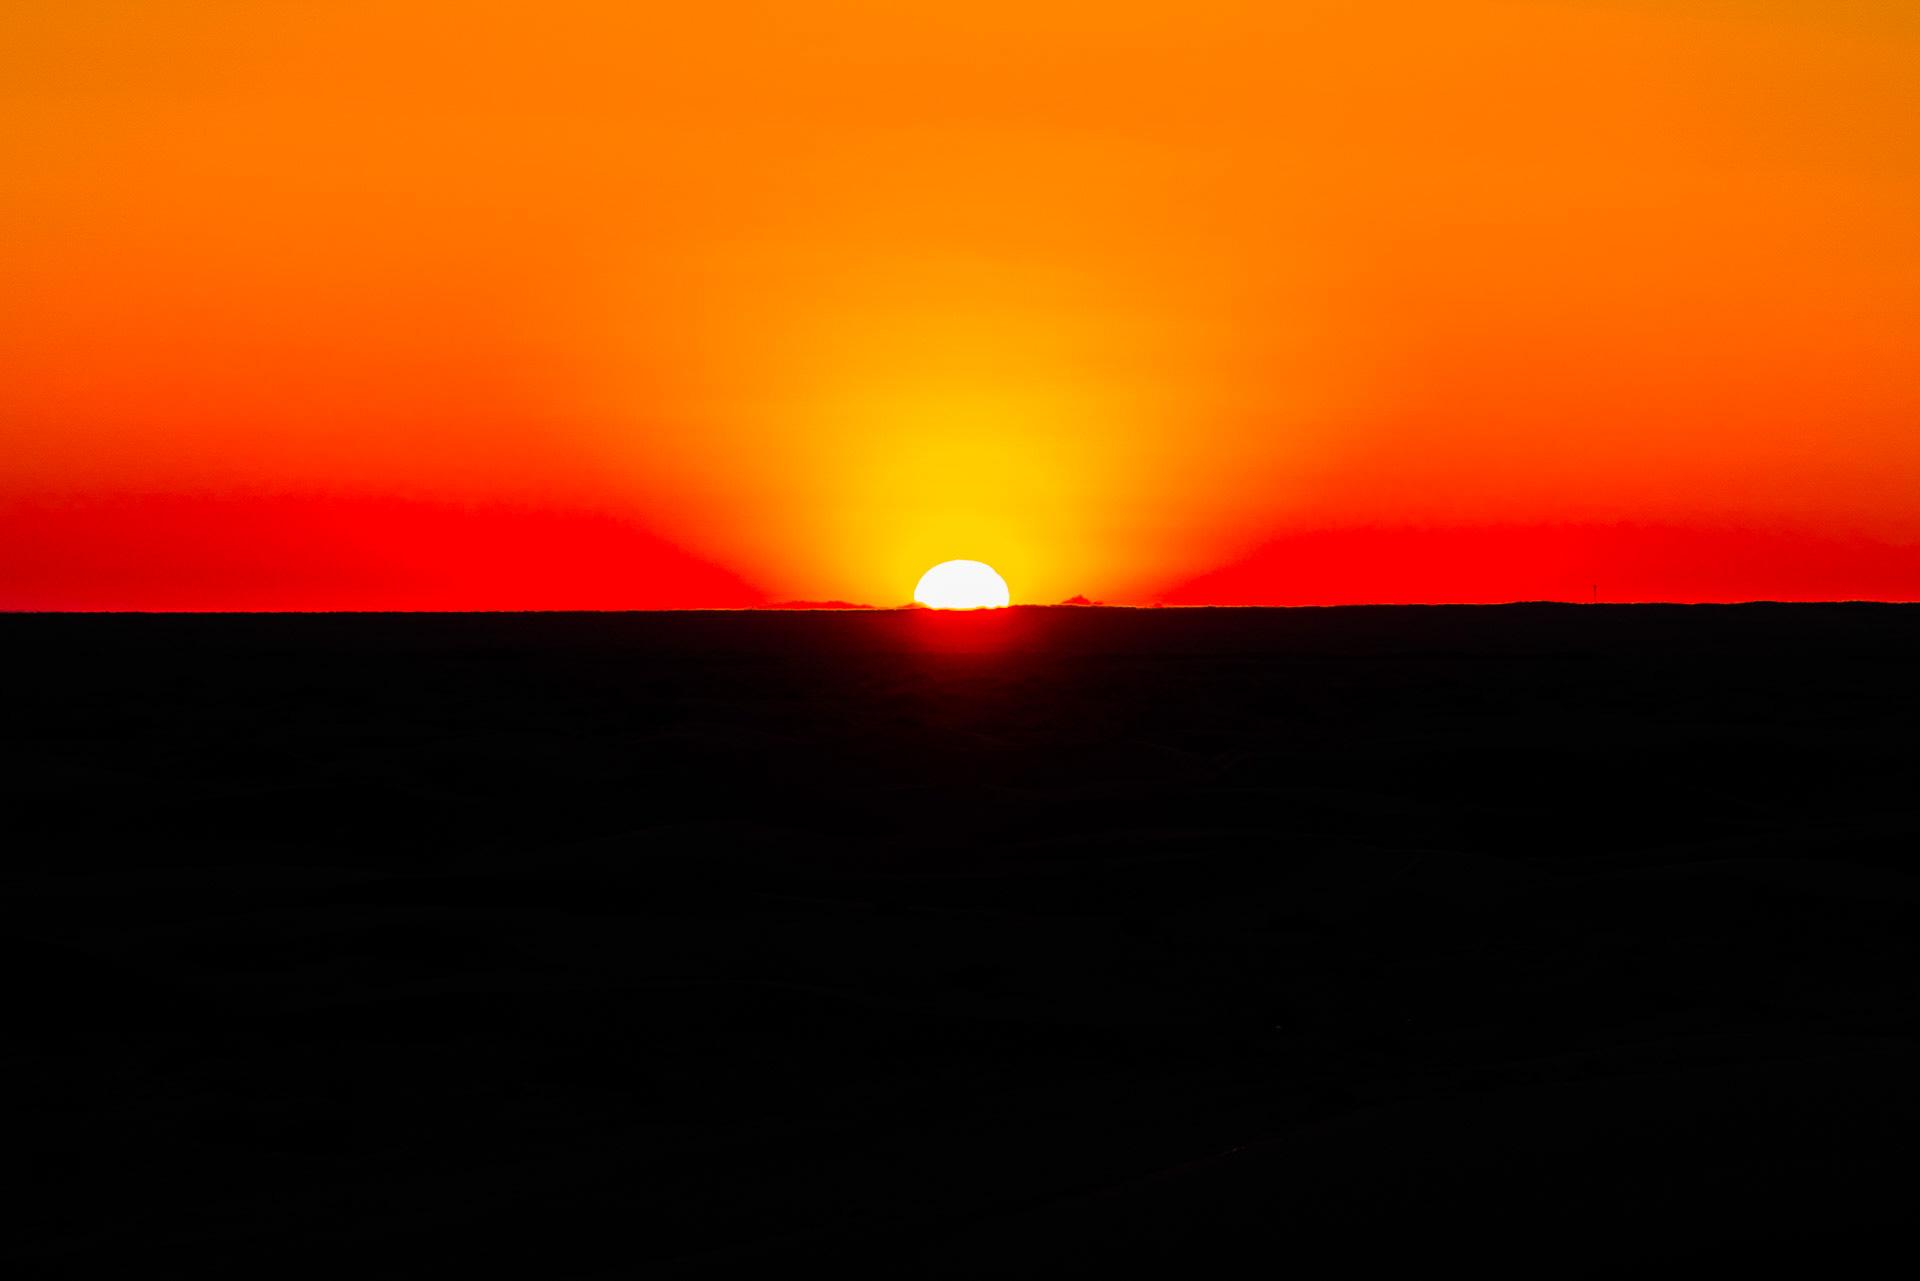 Maranjab Desert Kashan sunrise, kashan, iran, pescart, photo blog, travel blog, blog, photo travel blog, enrico pescantini, pescantini